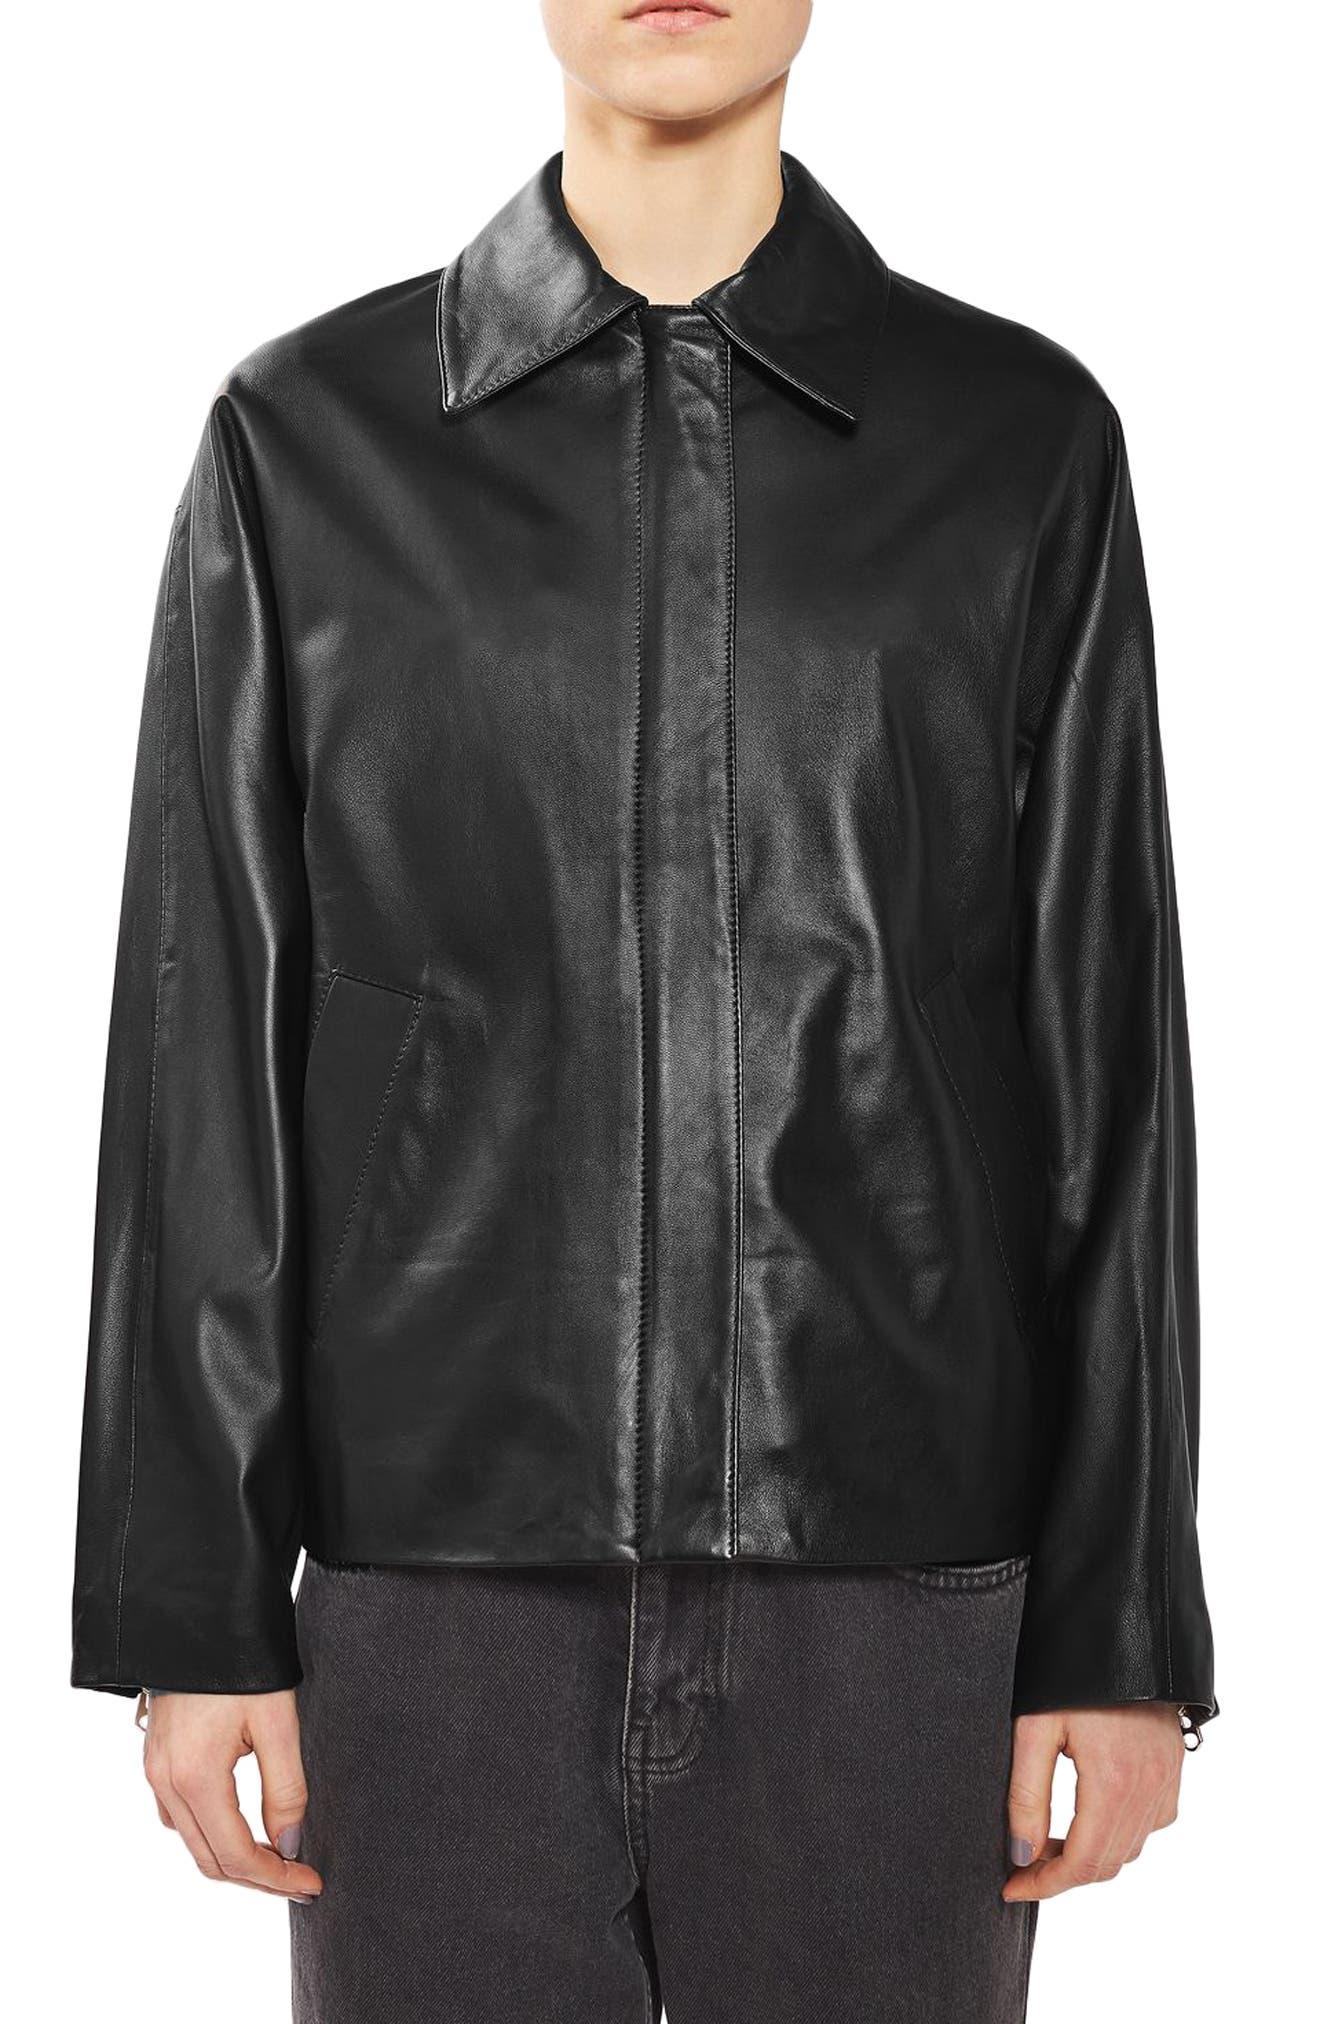 Topshop Boutique Leather Biker Shirt Jacket